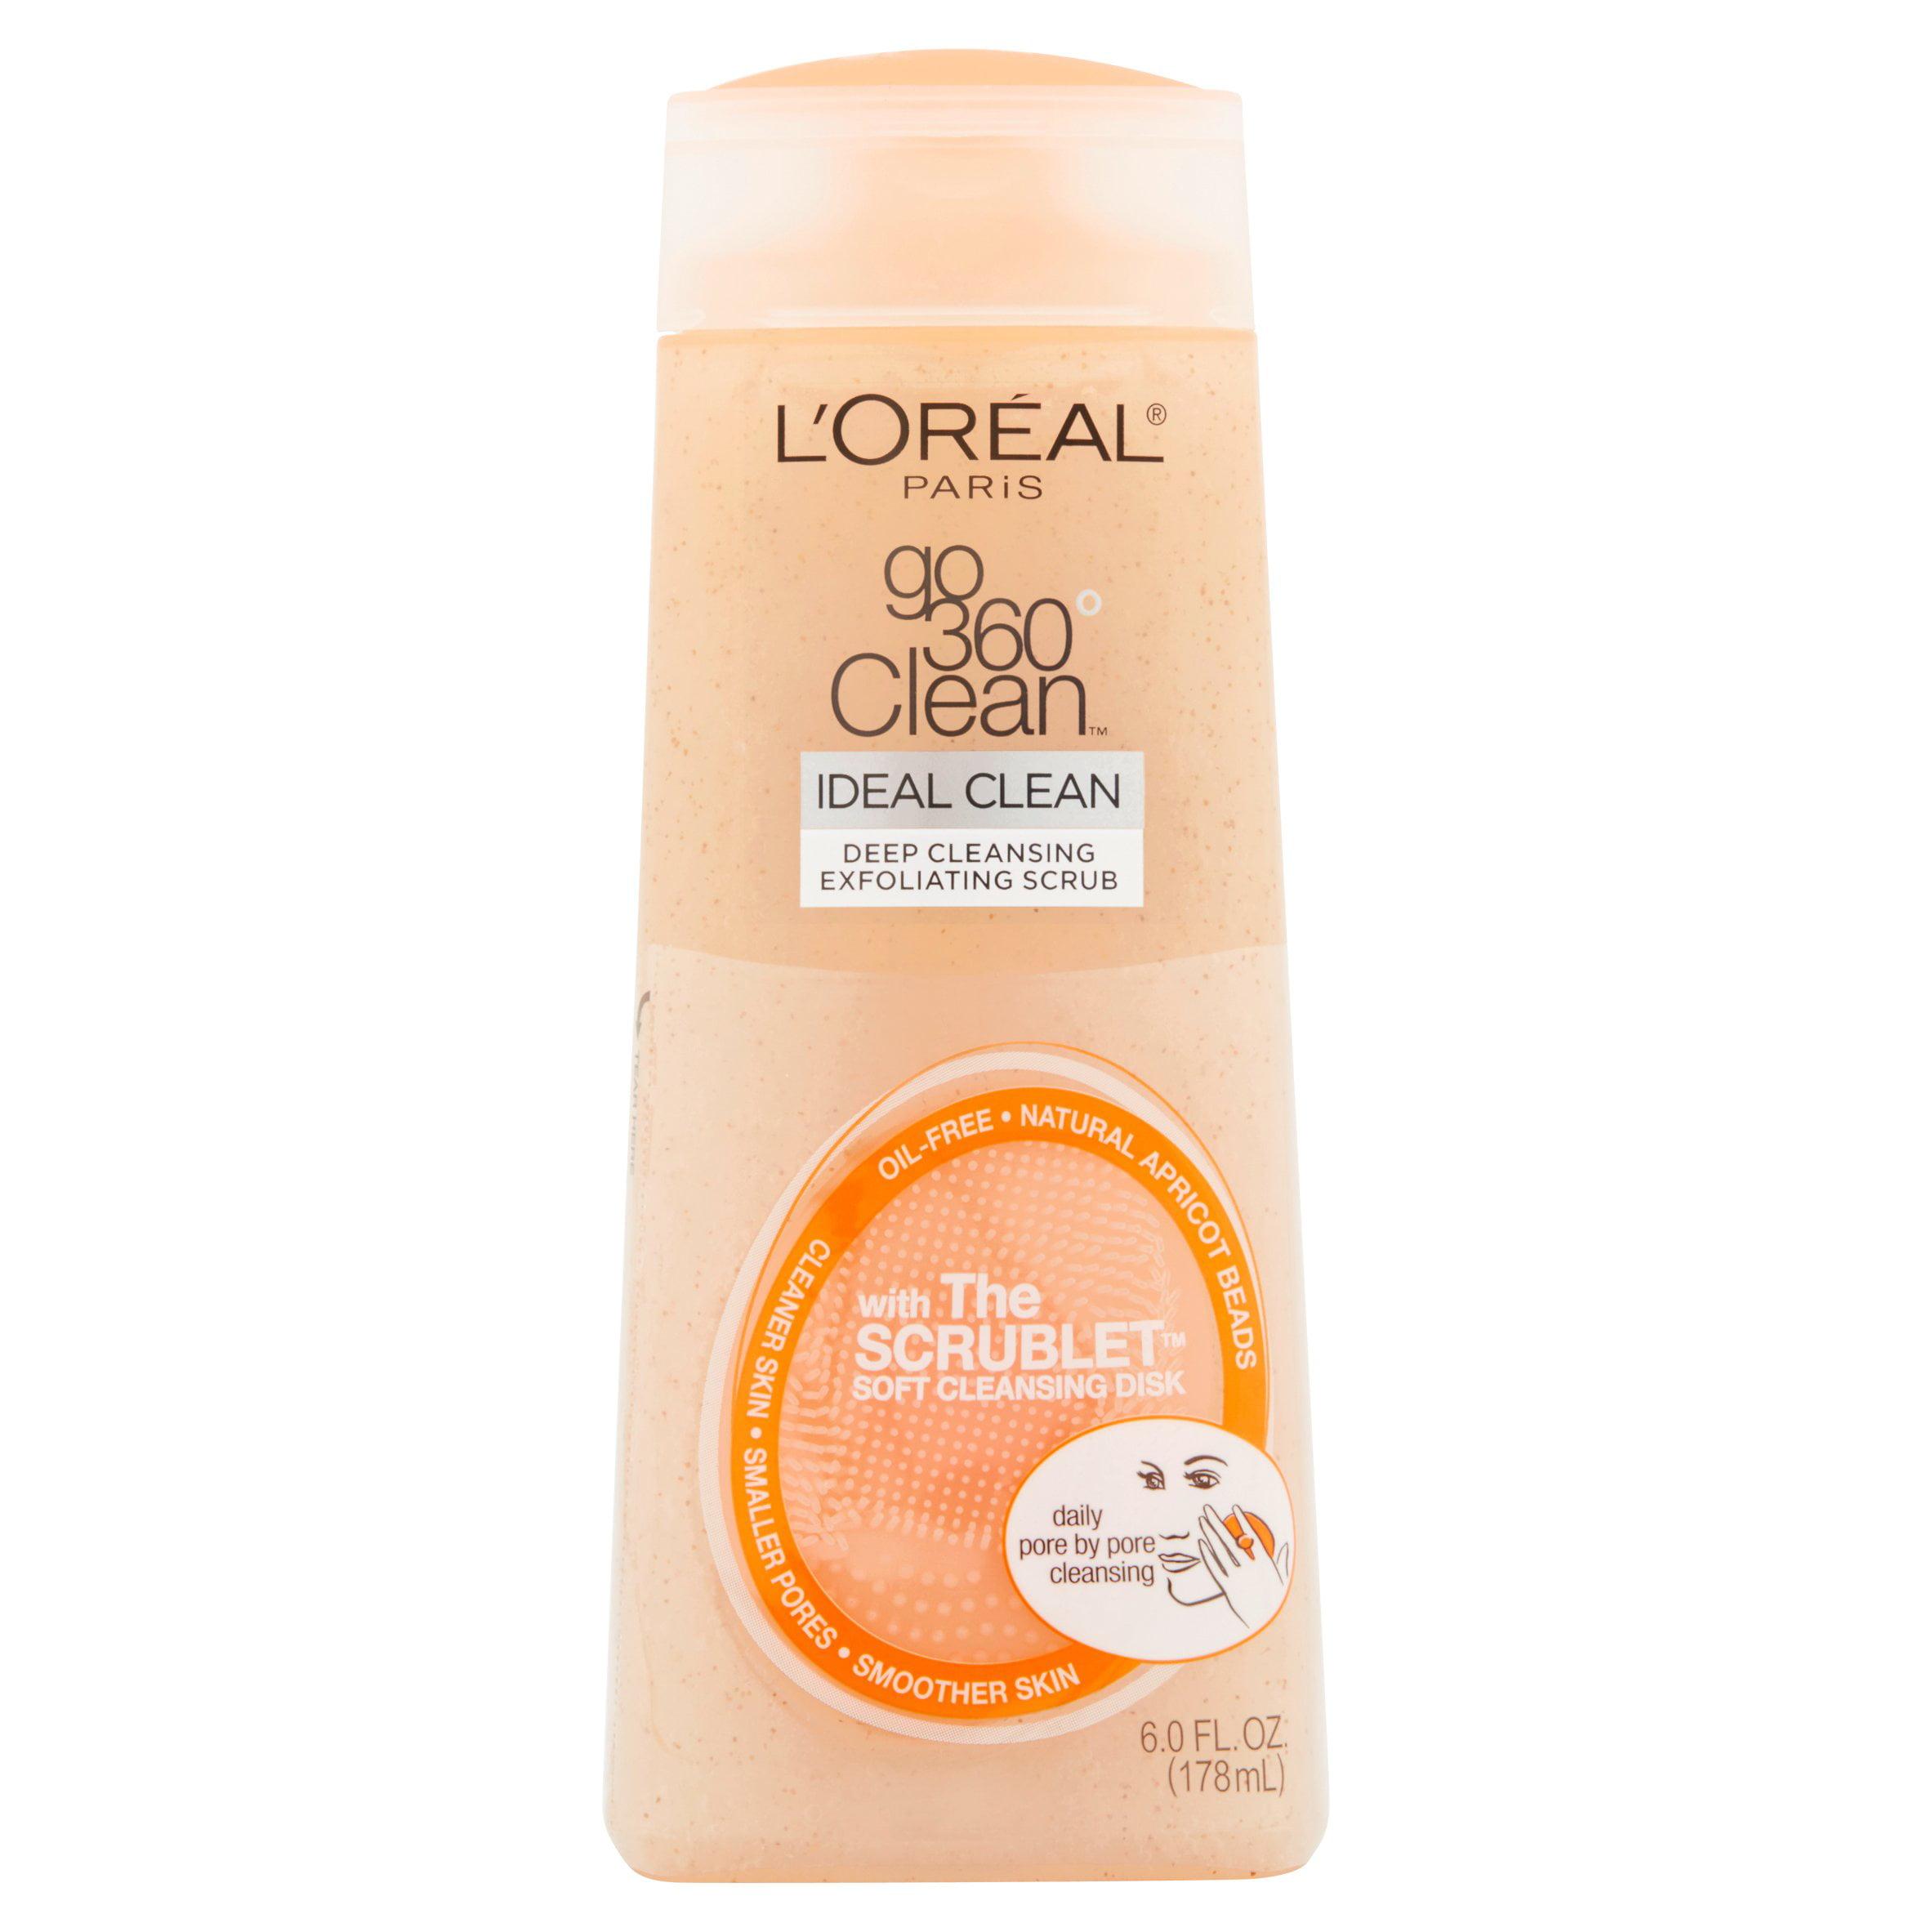 L'Oreal Paris Go 360 Clean Deep Exfoliating Scrub, 6 oz